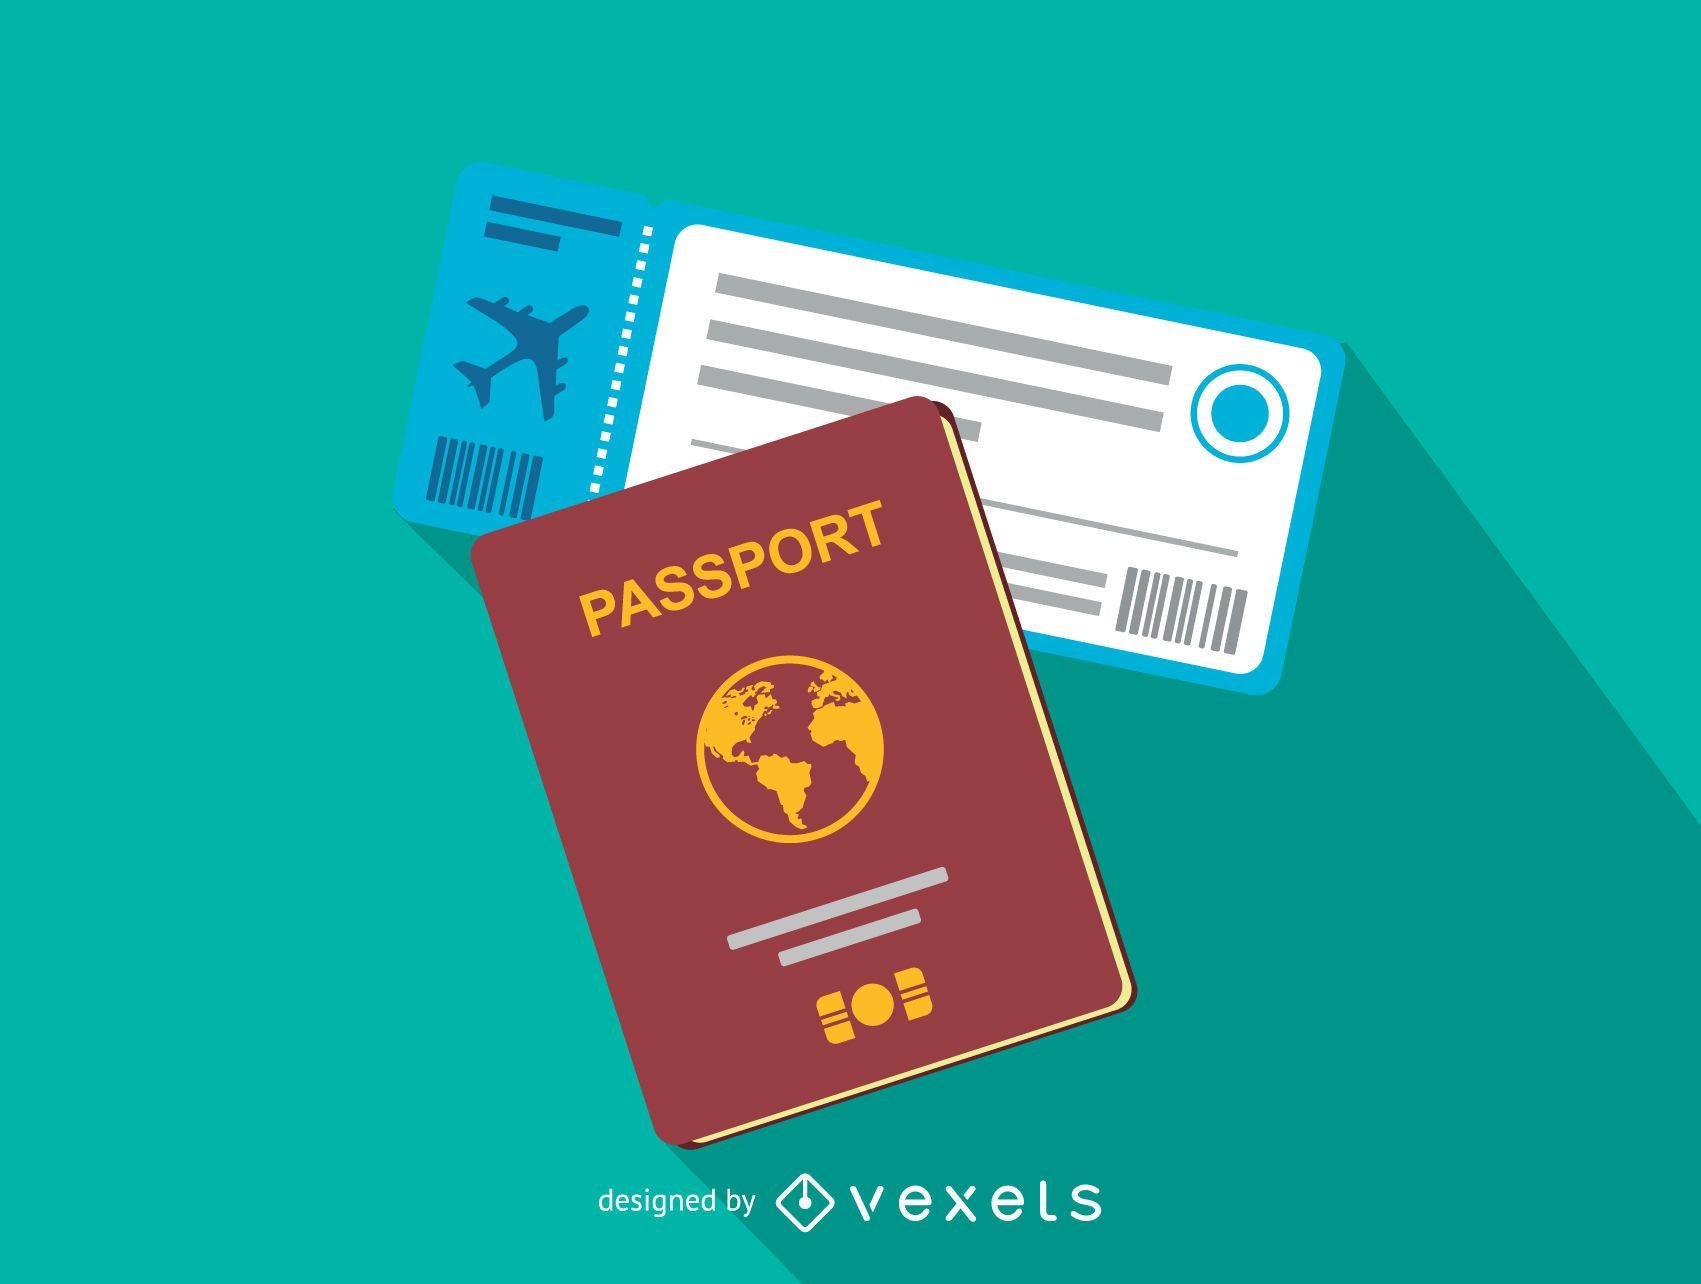 Passport and flight ticket icon